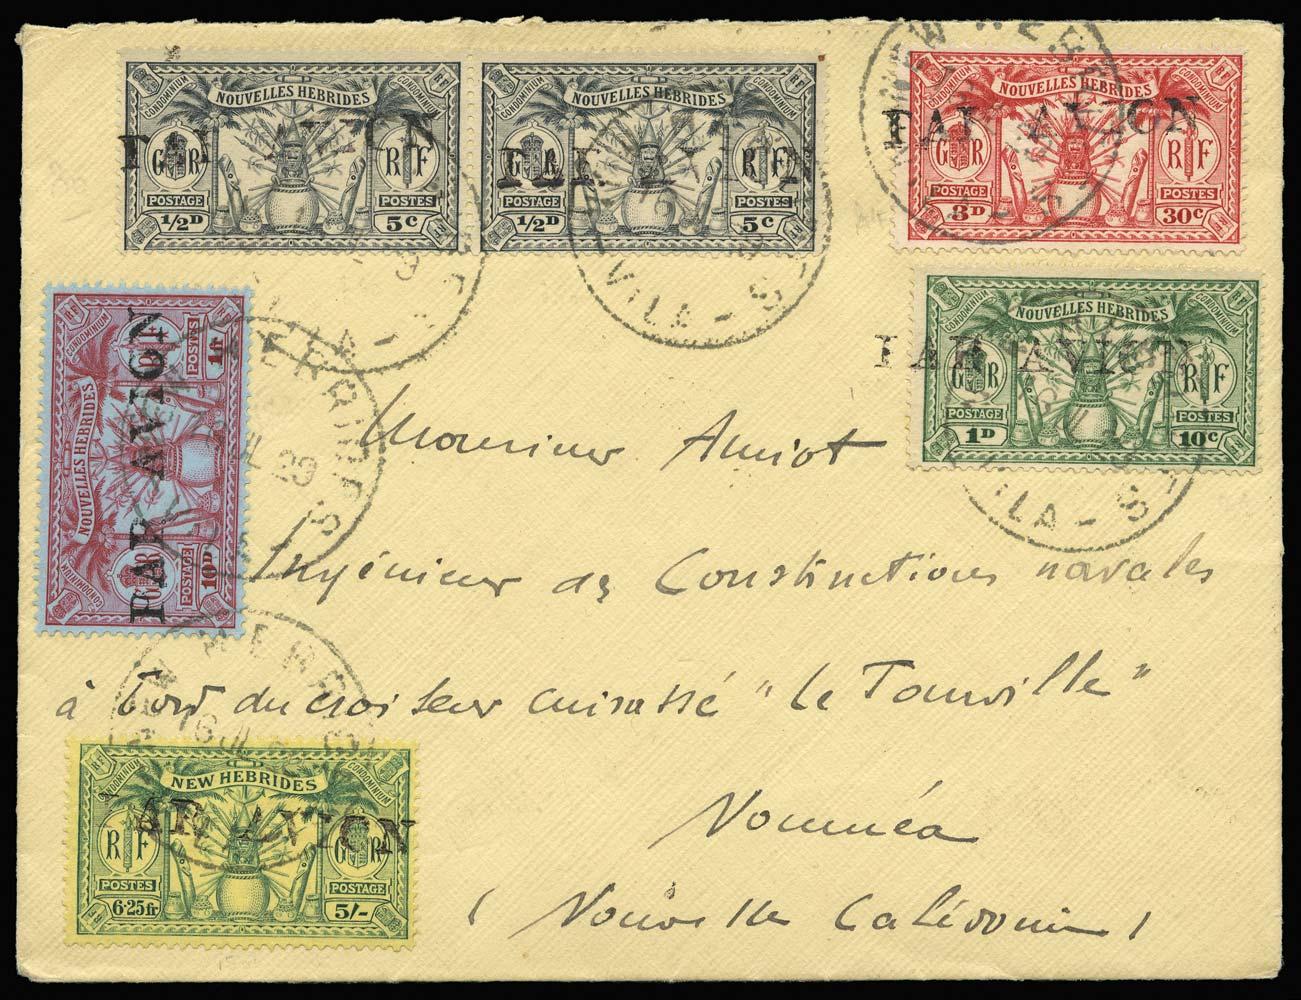 NEW HEBRIDES 1929  SG51, F42/3, F46, F50 Cover